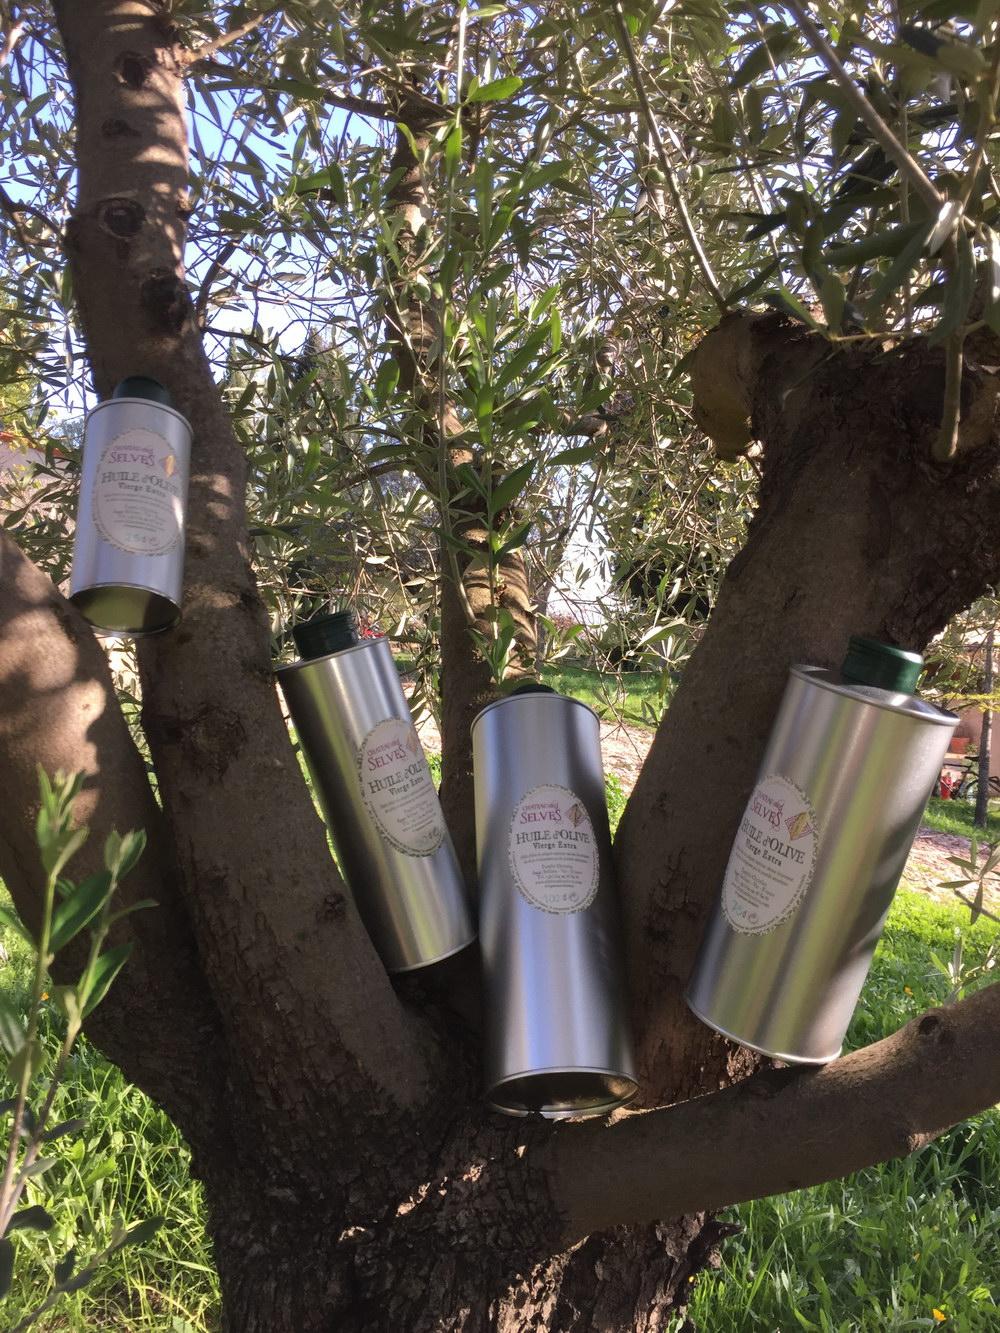 Huile d 39 olive de provence huile d 39 olive canton de for Huile d olive salon de provence